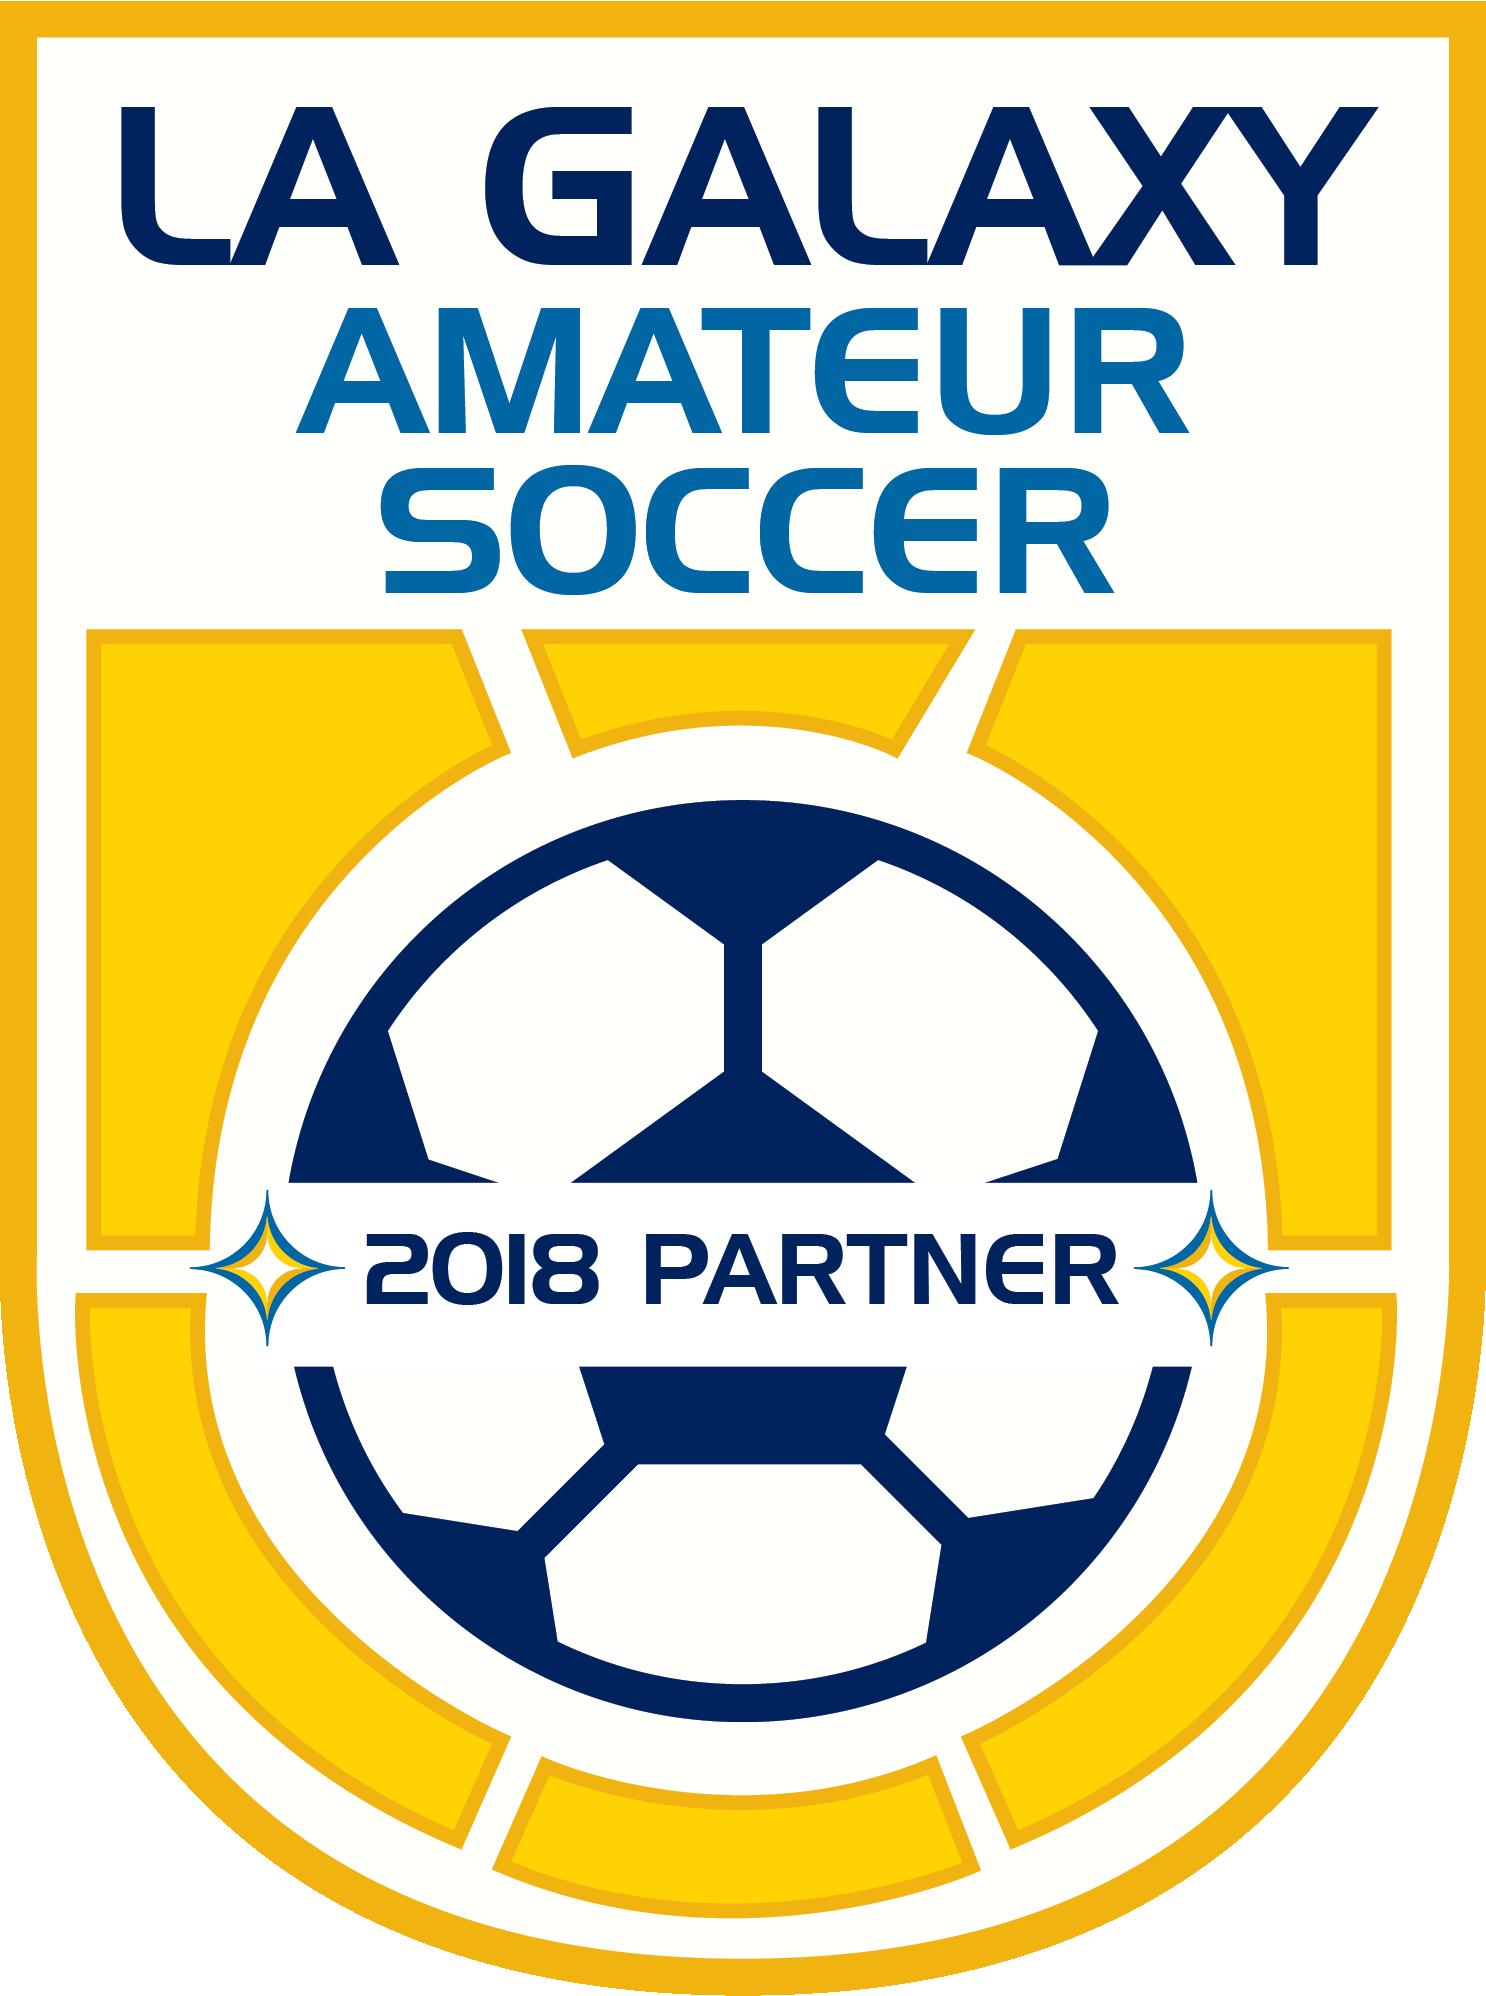 LA Galaxy Amateur